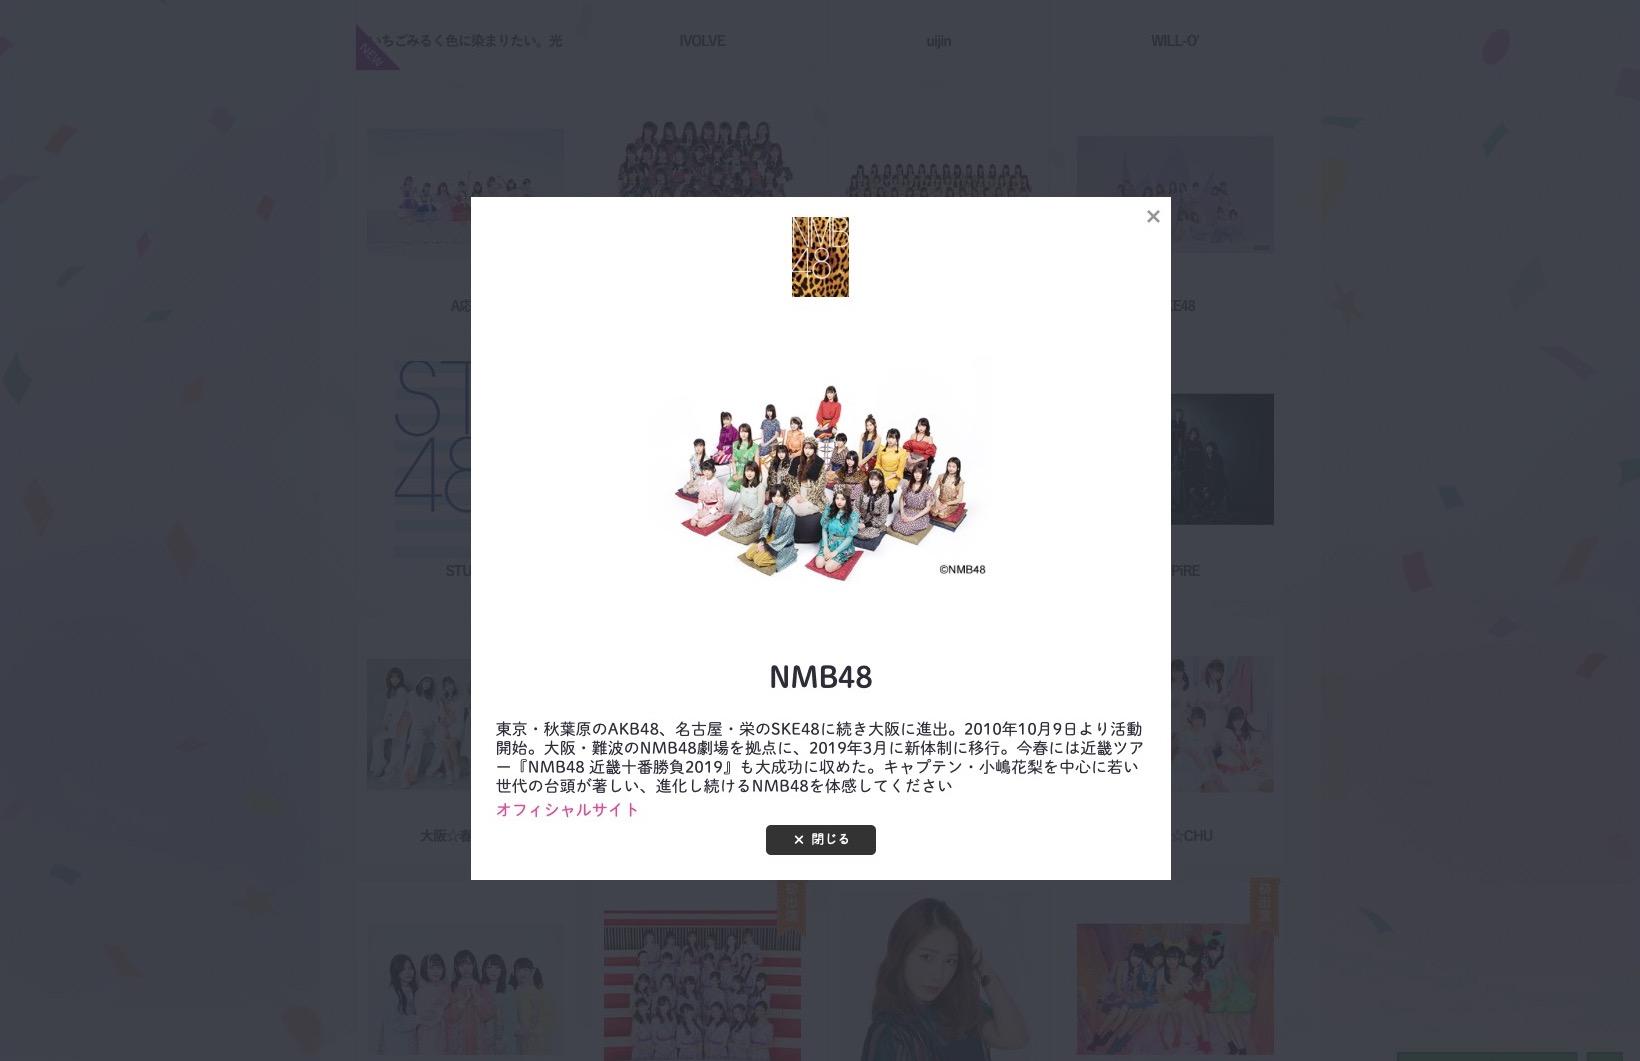 【NMB48】TOKYO IDOL FESTIVAL 2019にNMB48の出演が決定。